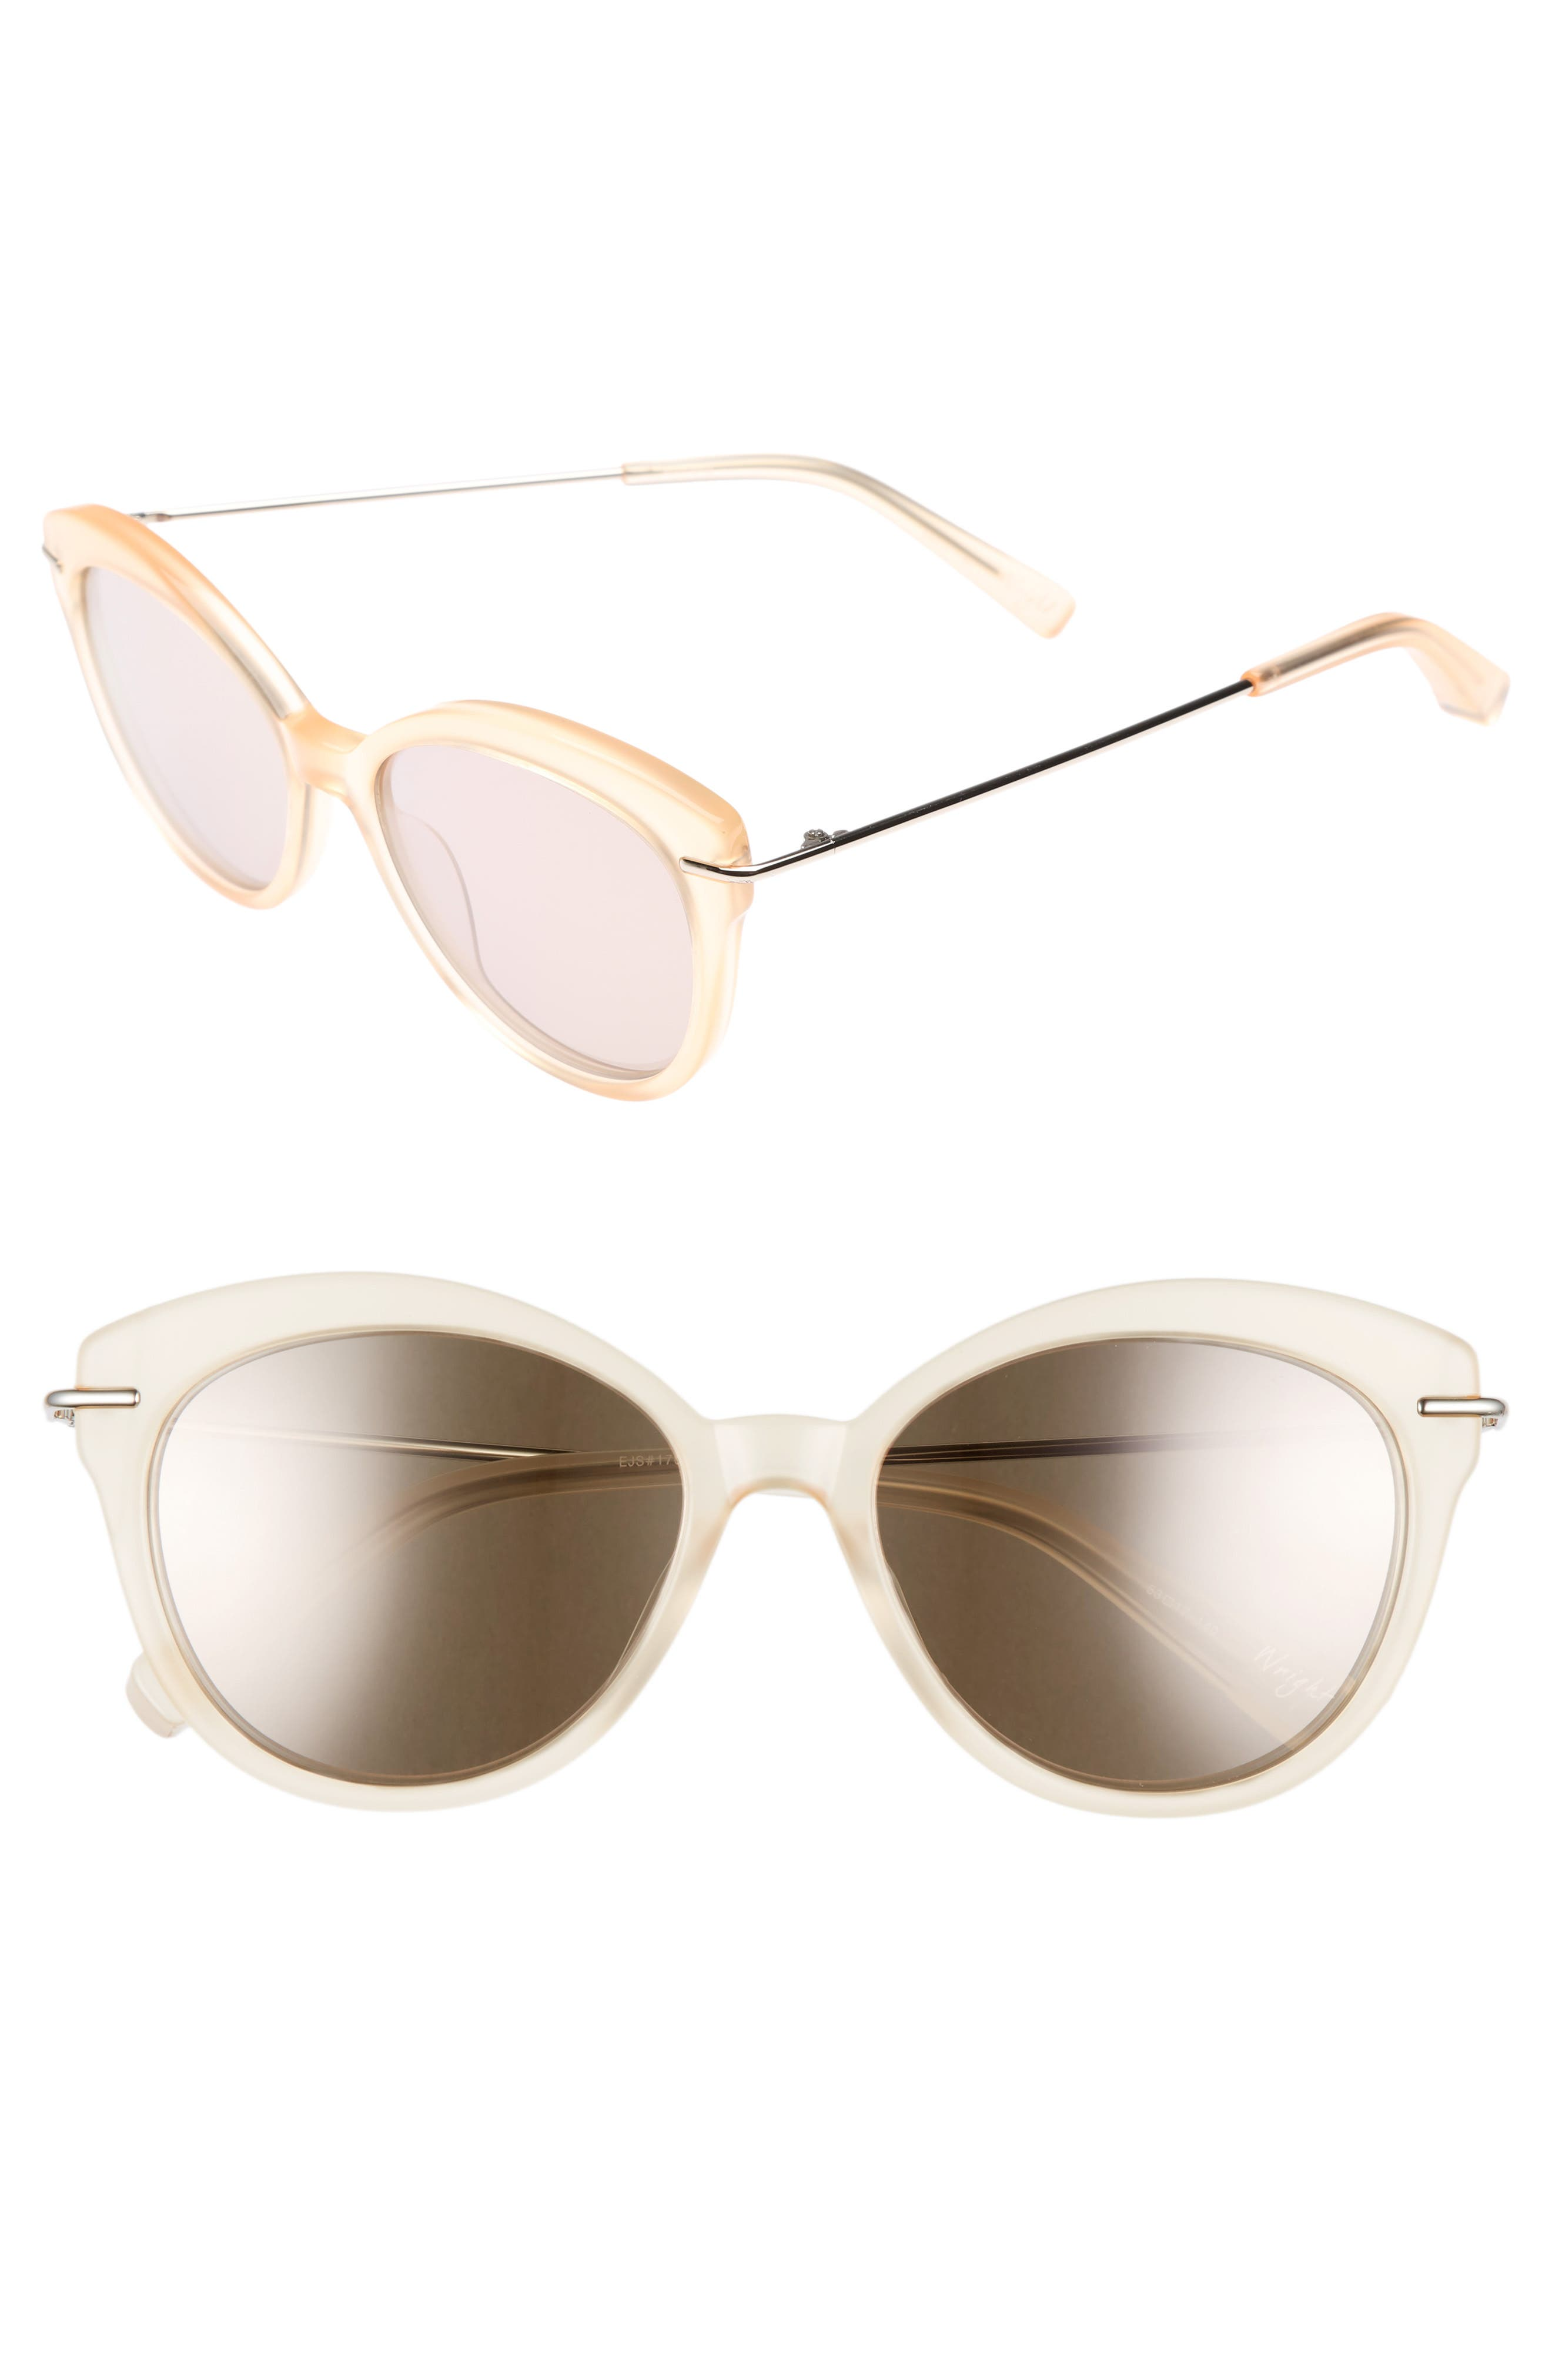 Wright 53mm Cat Eye Sunglasses,                             Main thumbnail 1, color,                             Lemon